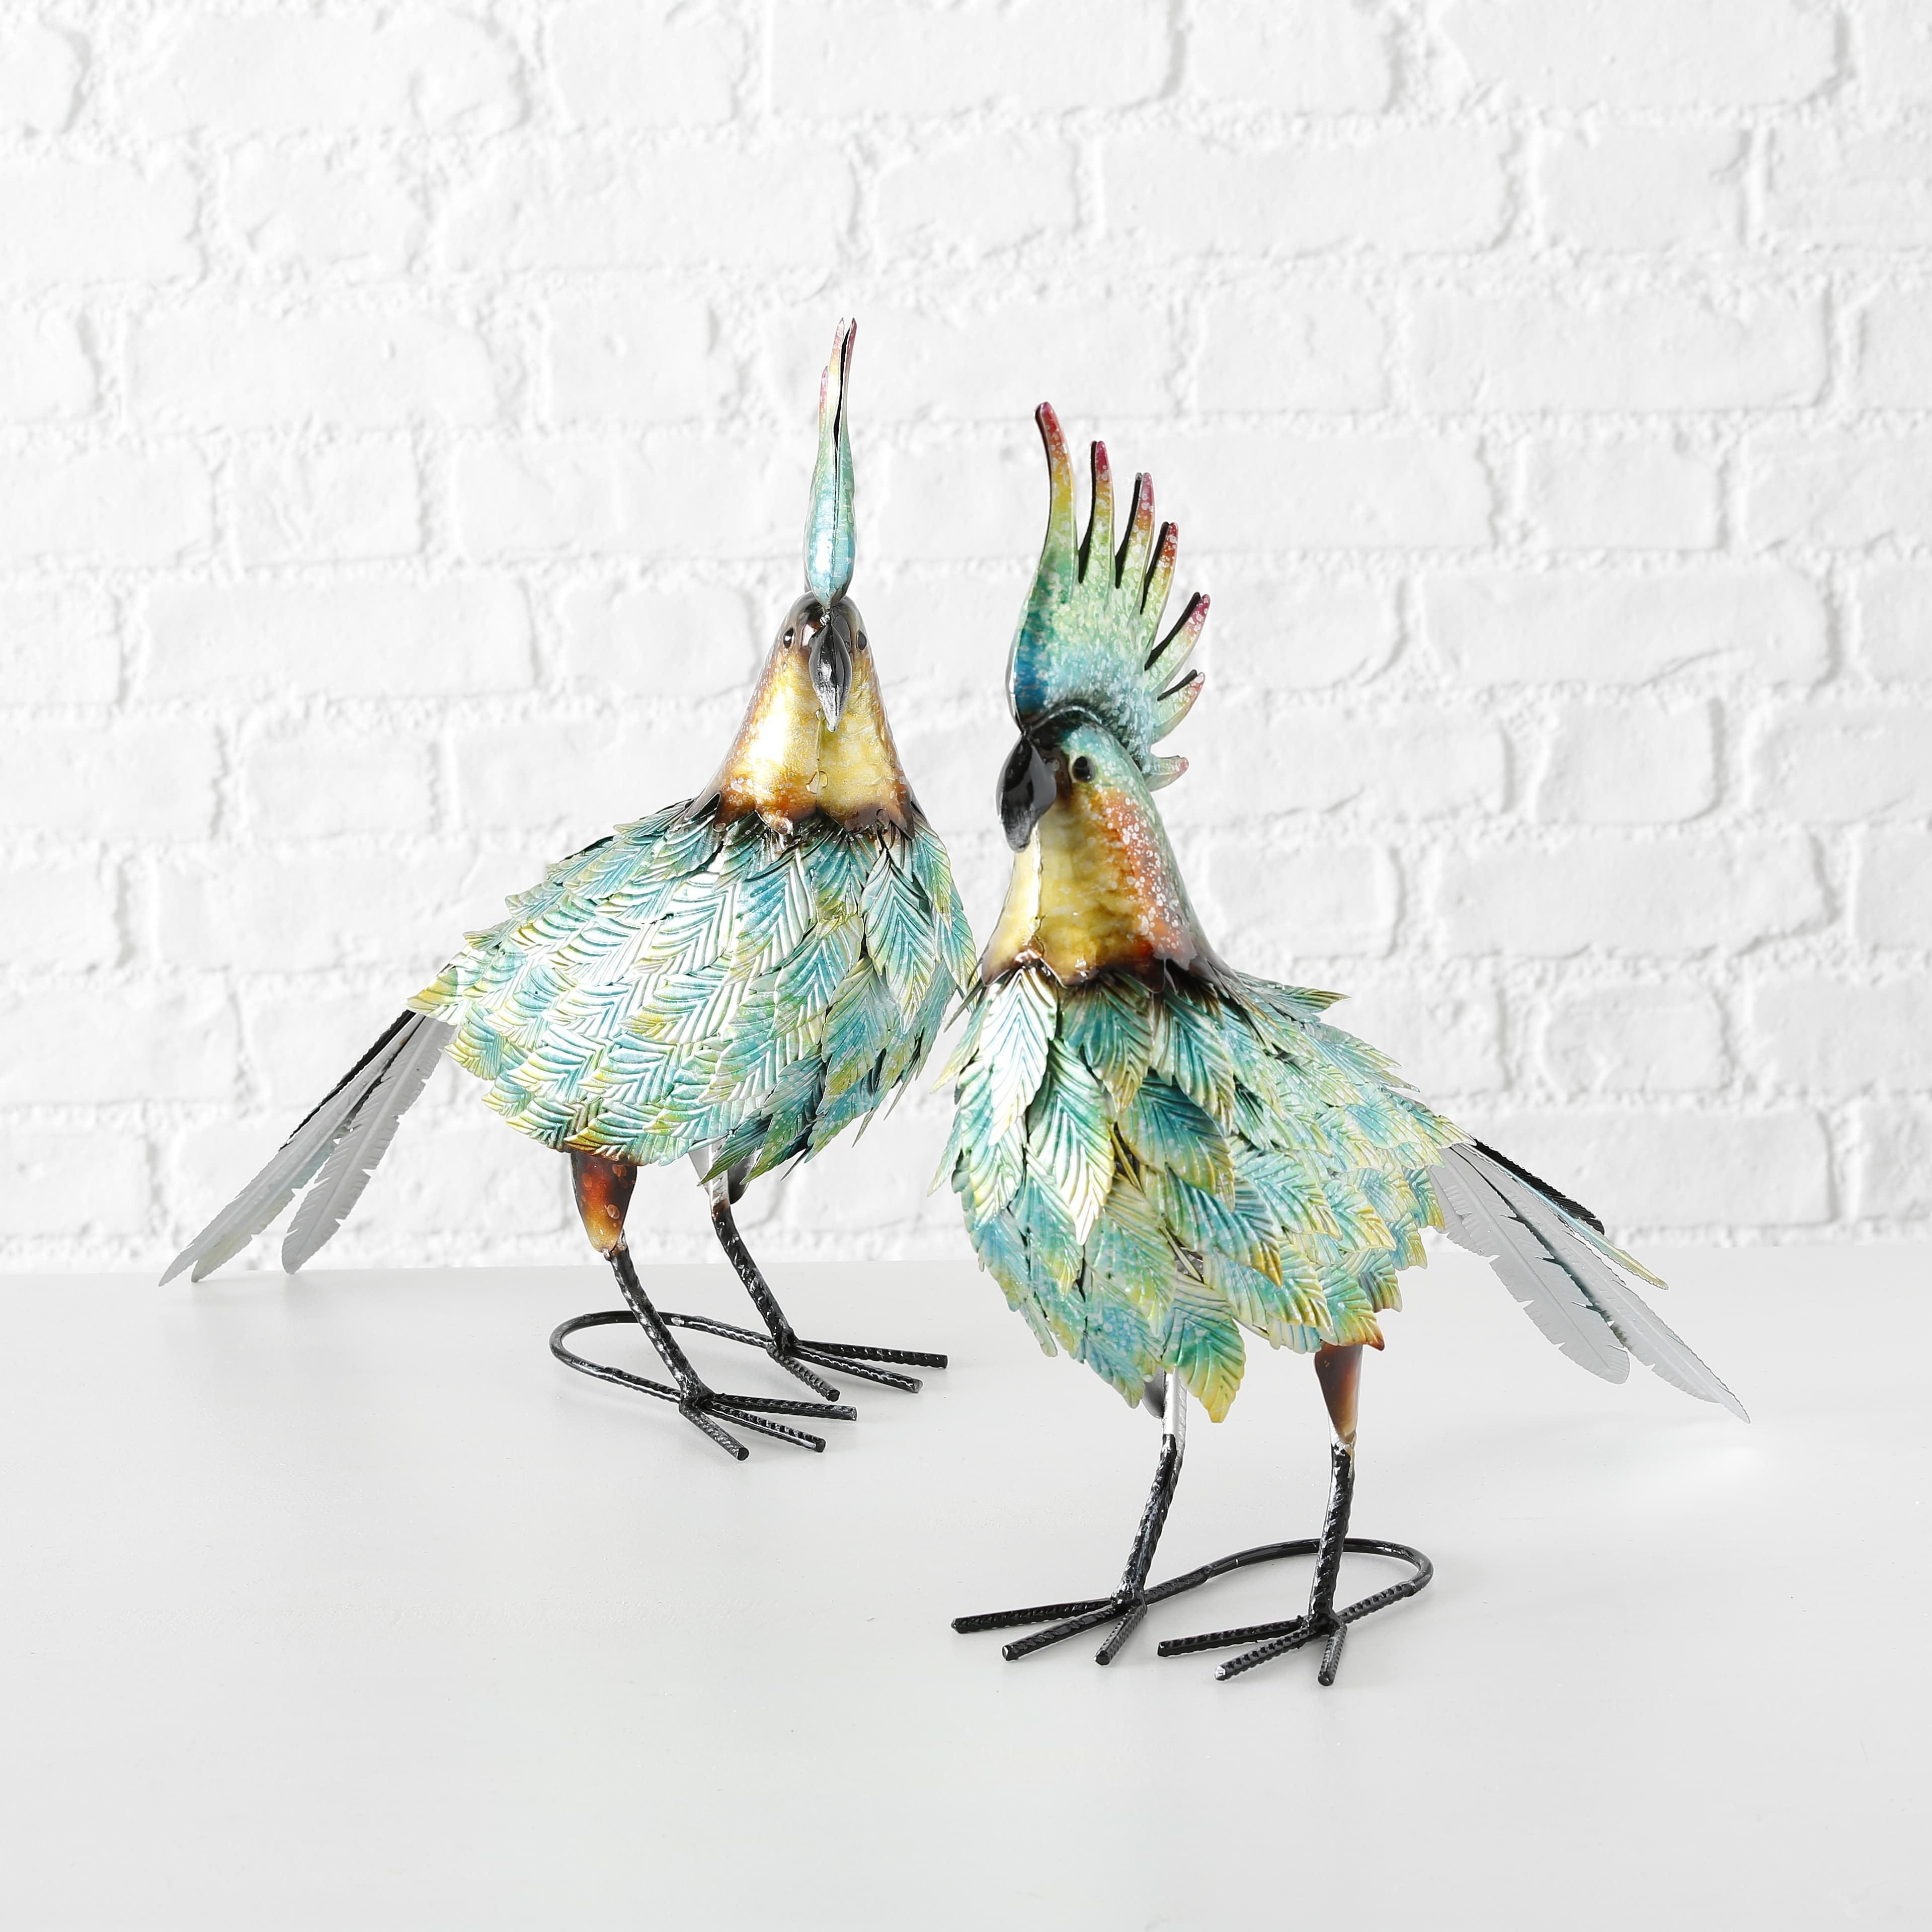 Decoratiune metalica Gringo Bird Multicolor, Modele Asortate, l43xA15xH43 cm